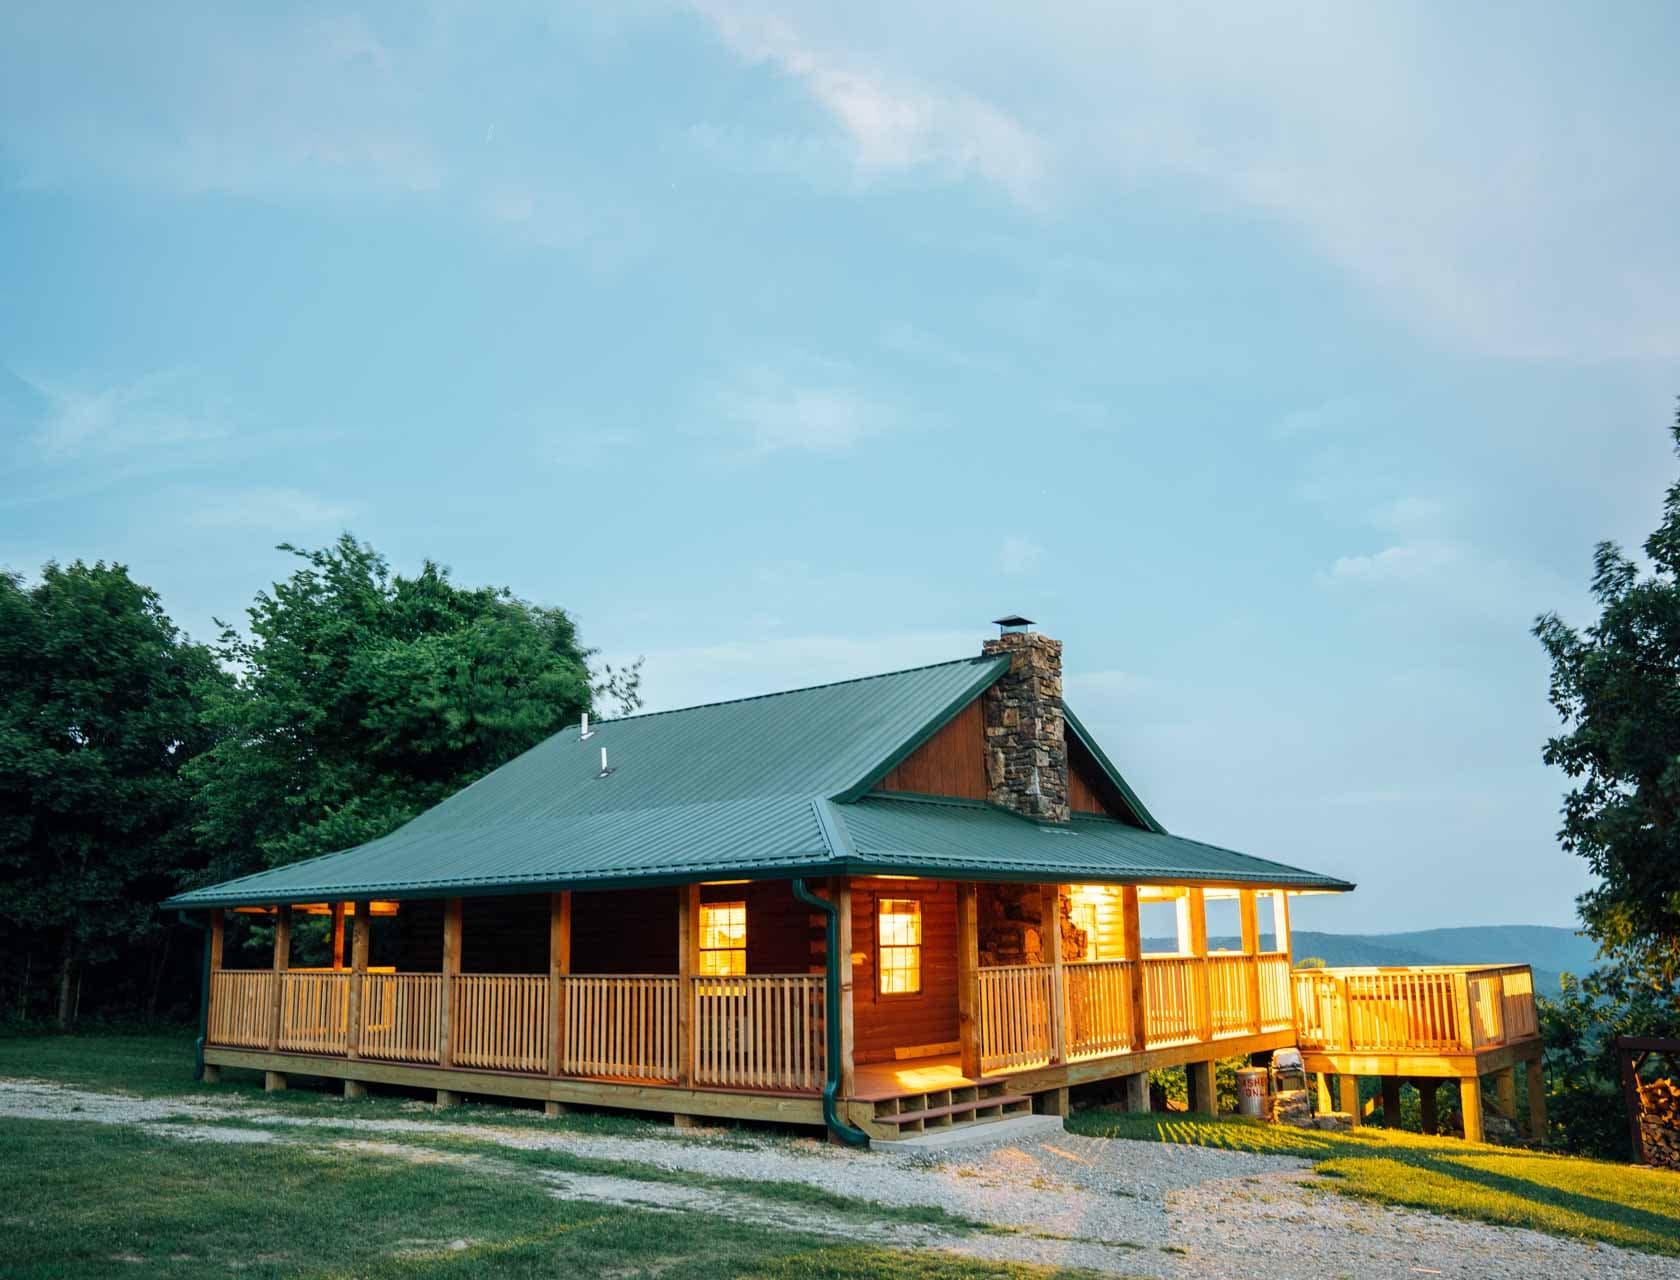 The Buffalo River Cabin overlooks the finest scenery in Arkansas.